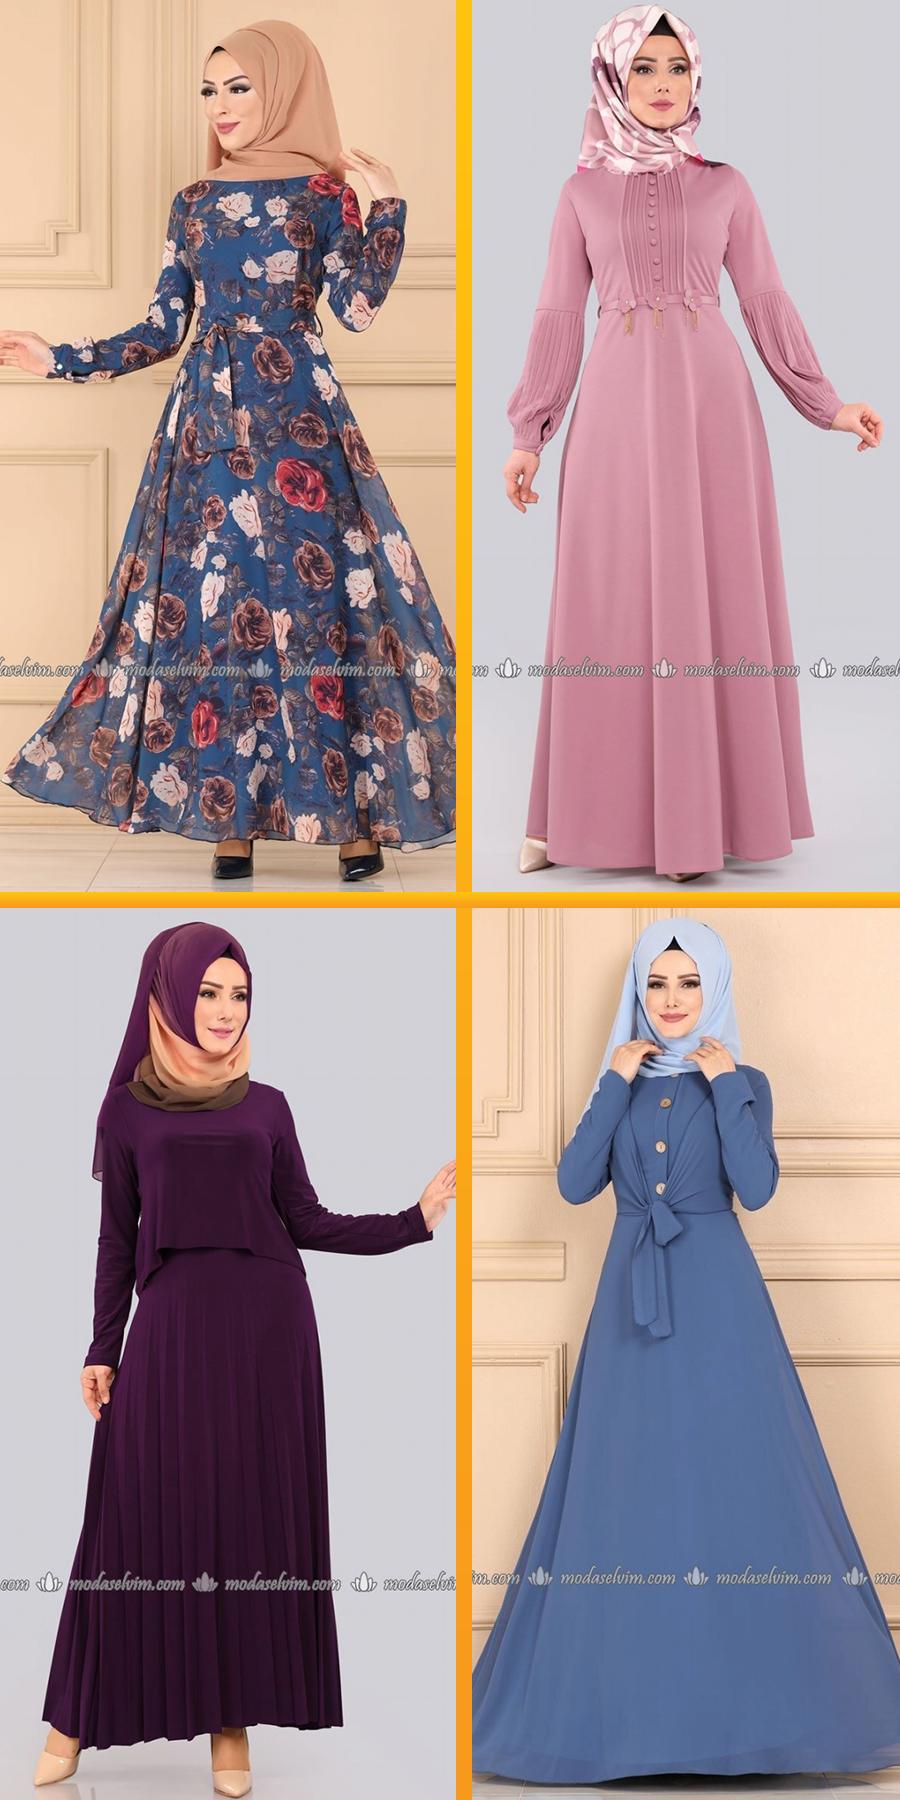 Modaselvim Elbise Modelleri 2020 1 2020 Elbise Modelleri Elbise Moda